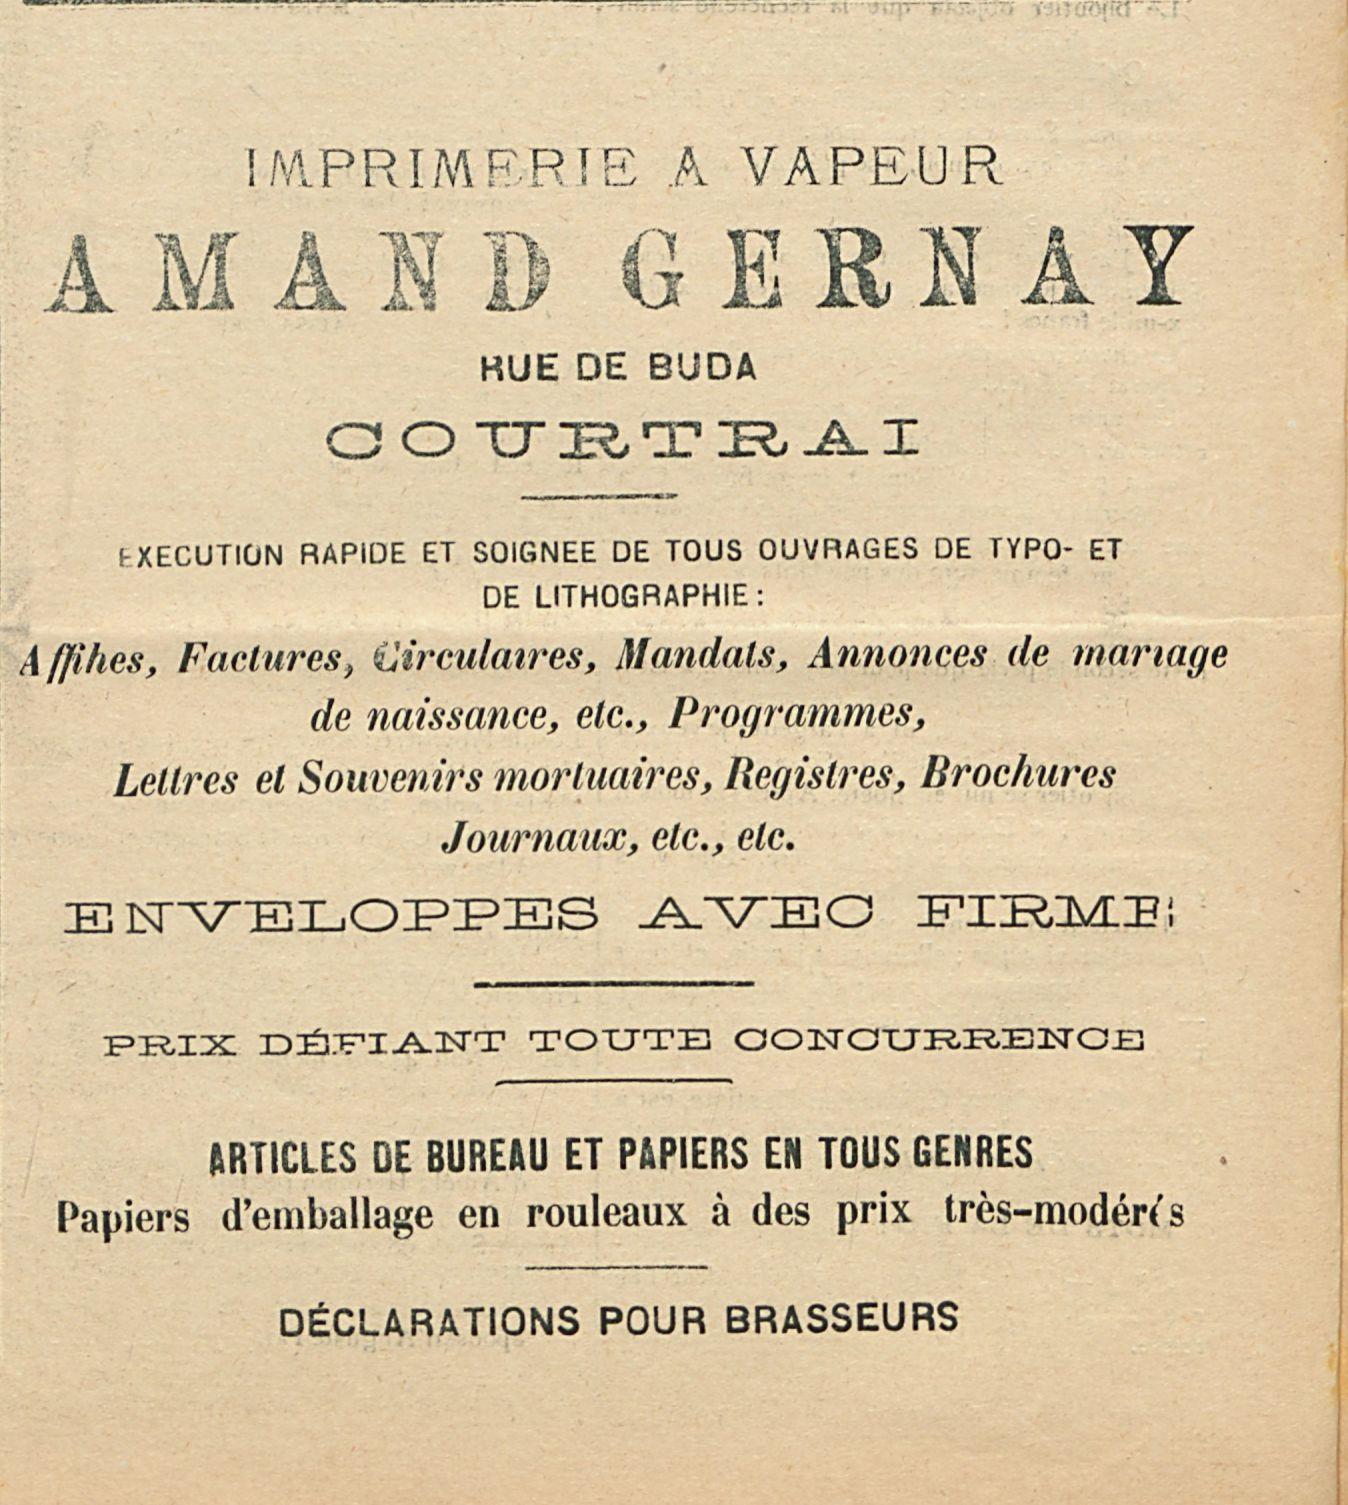 AMAND GERNAY